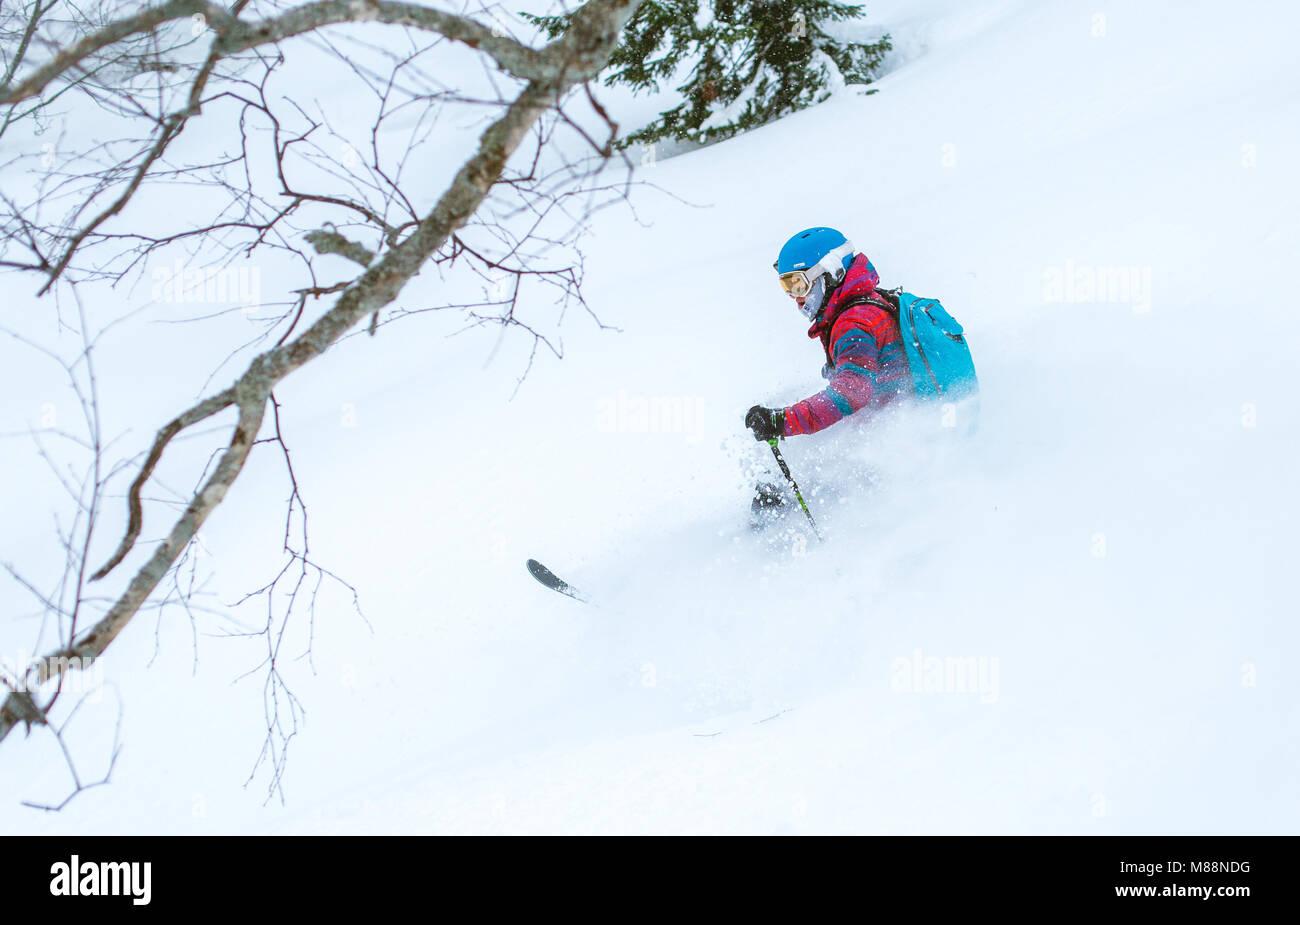 Happy skiing day in powder. Trans Ili Alatau mountains. Almaty region. Kazakhstan. - Stock Image